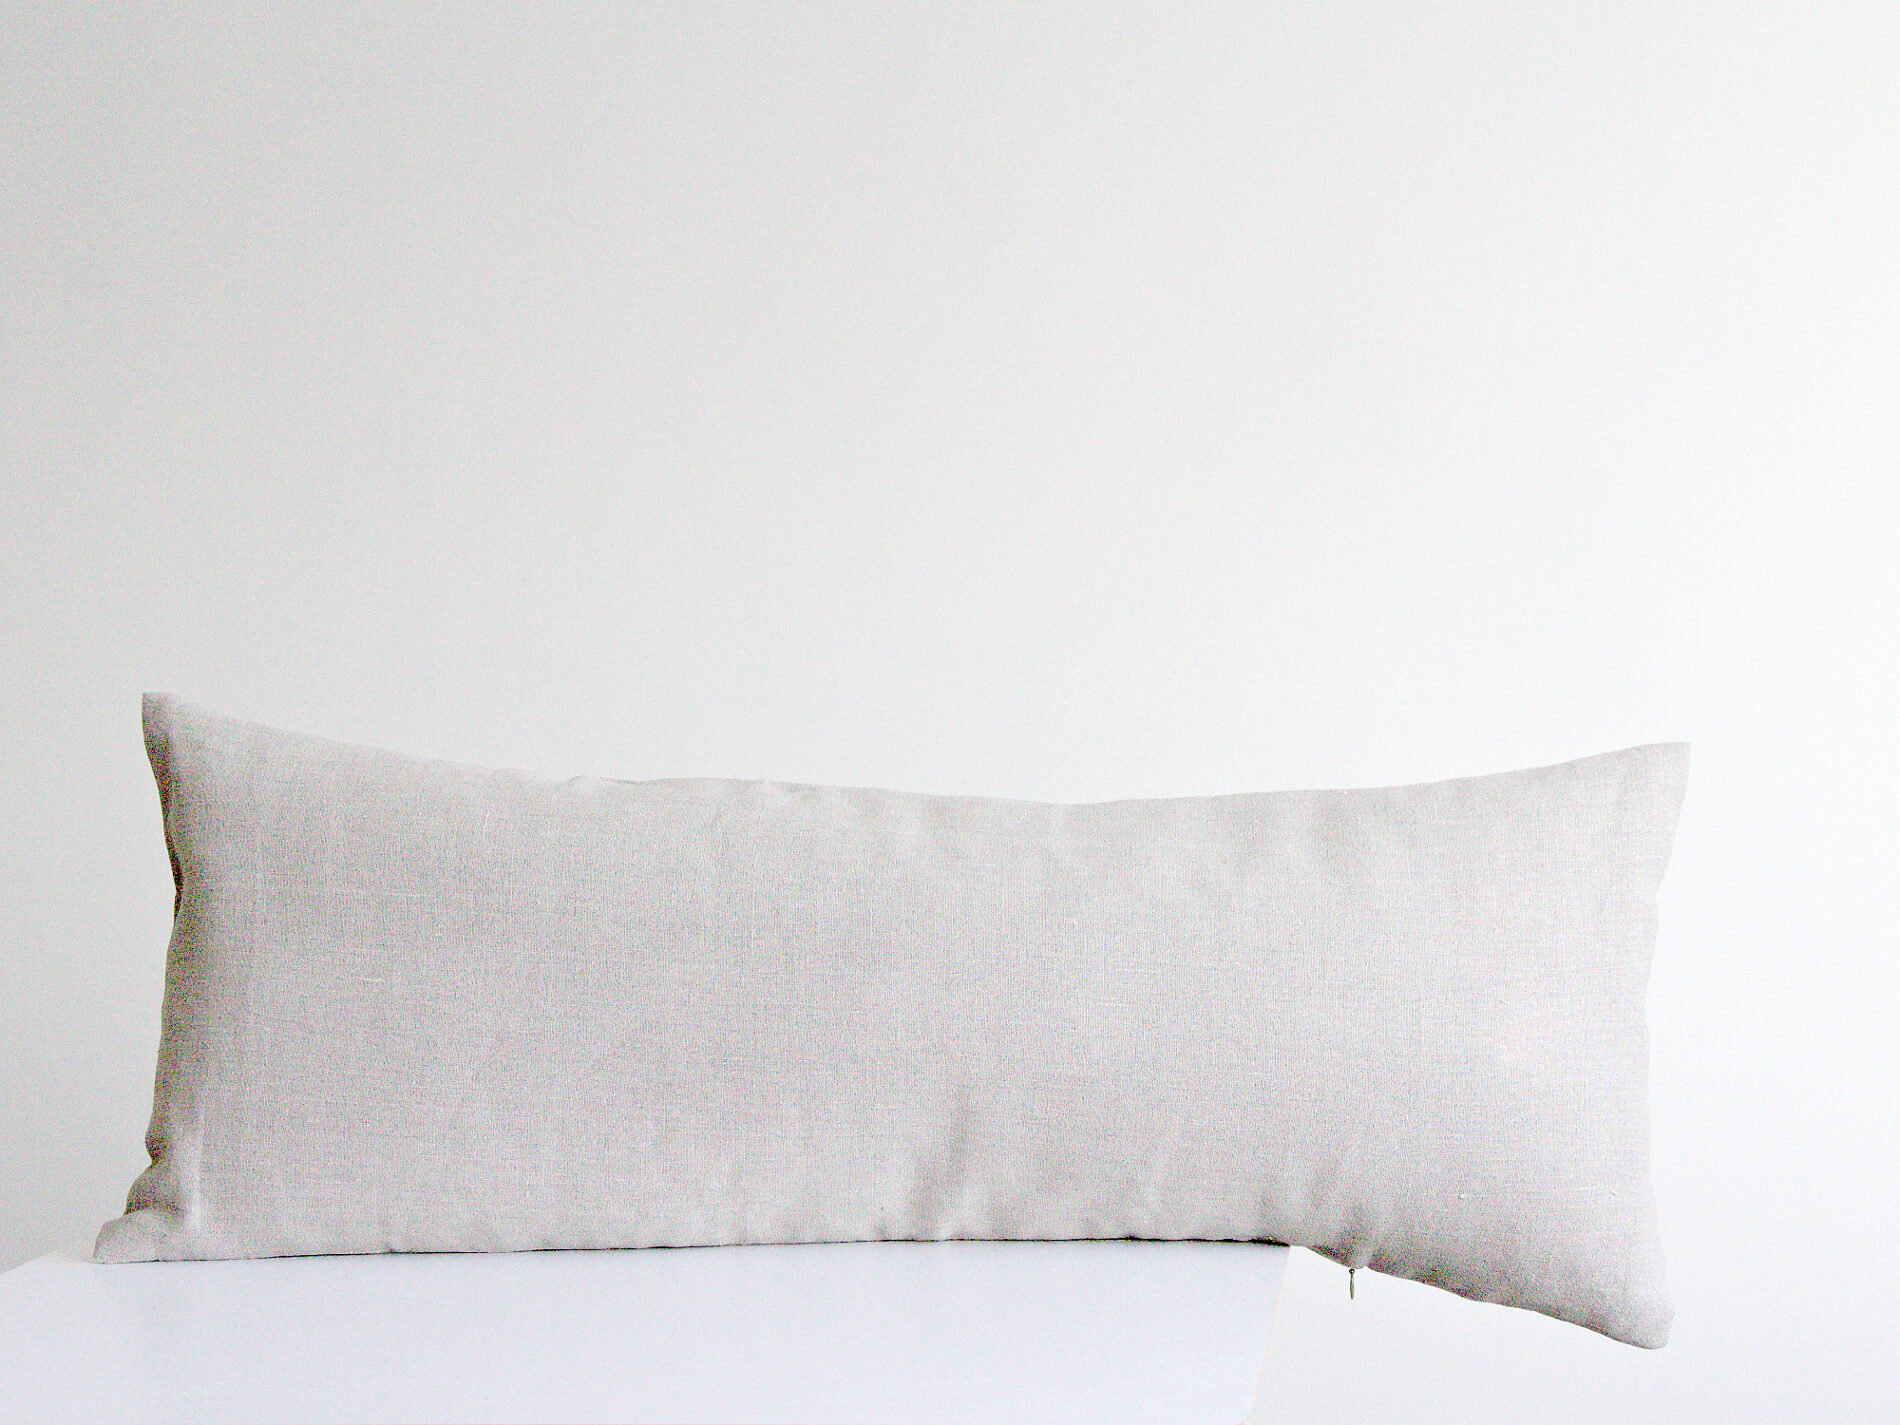 extra long lumbar pillow cover natural undyed linen flax